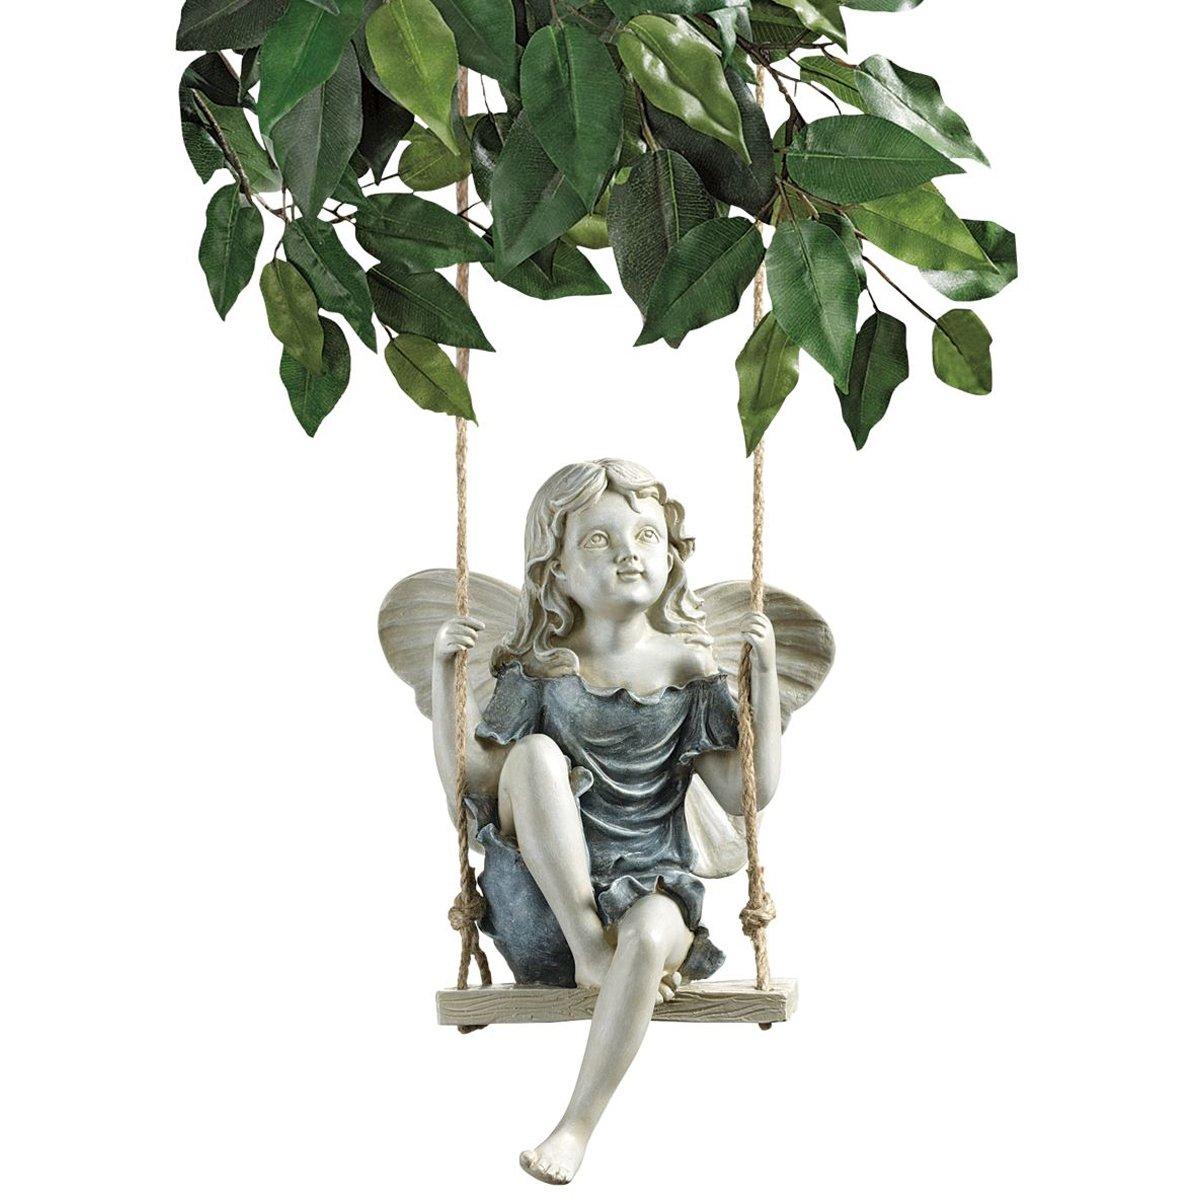 Design Toscano Summertime Fairy on a Swing Statue Interpet Ltd EU42046